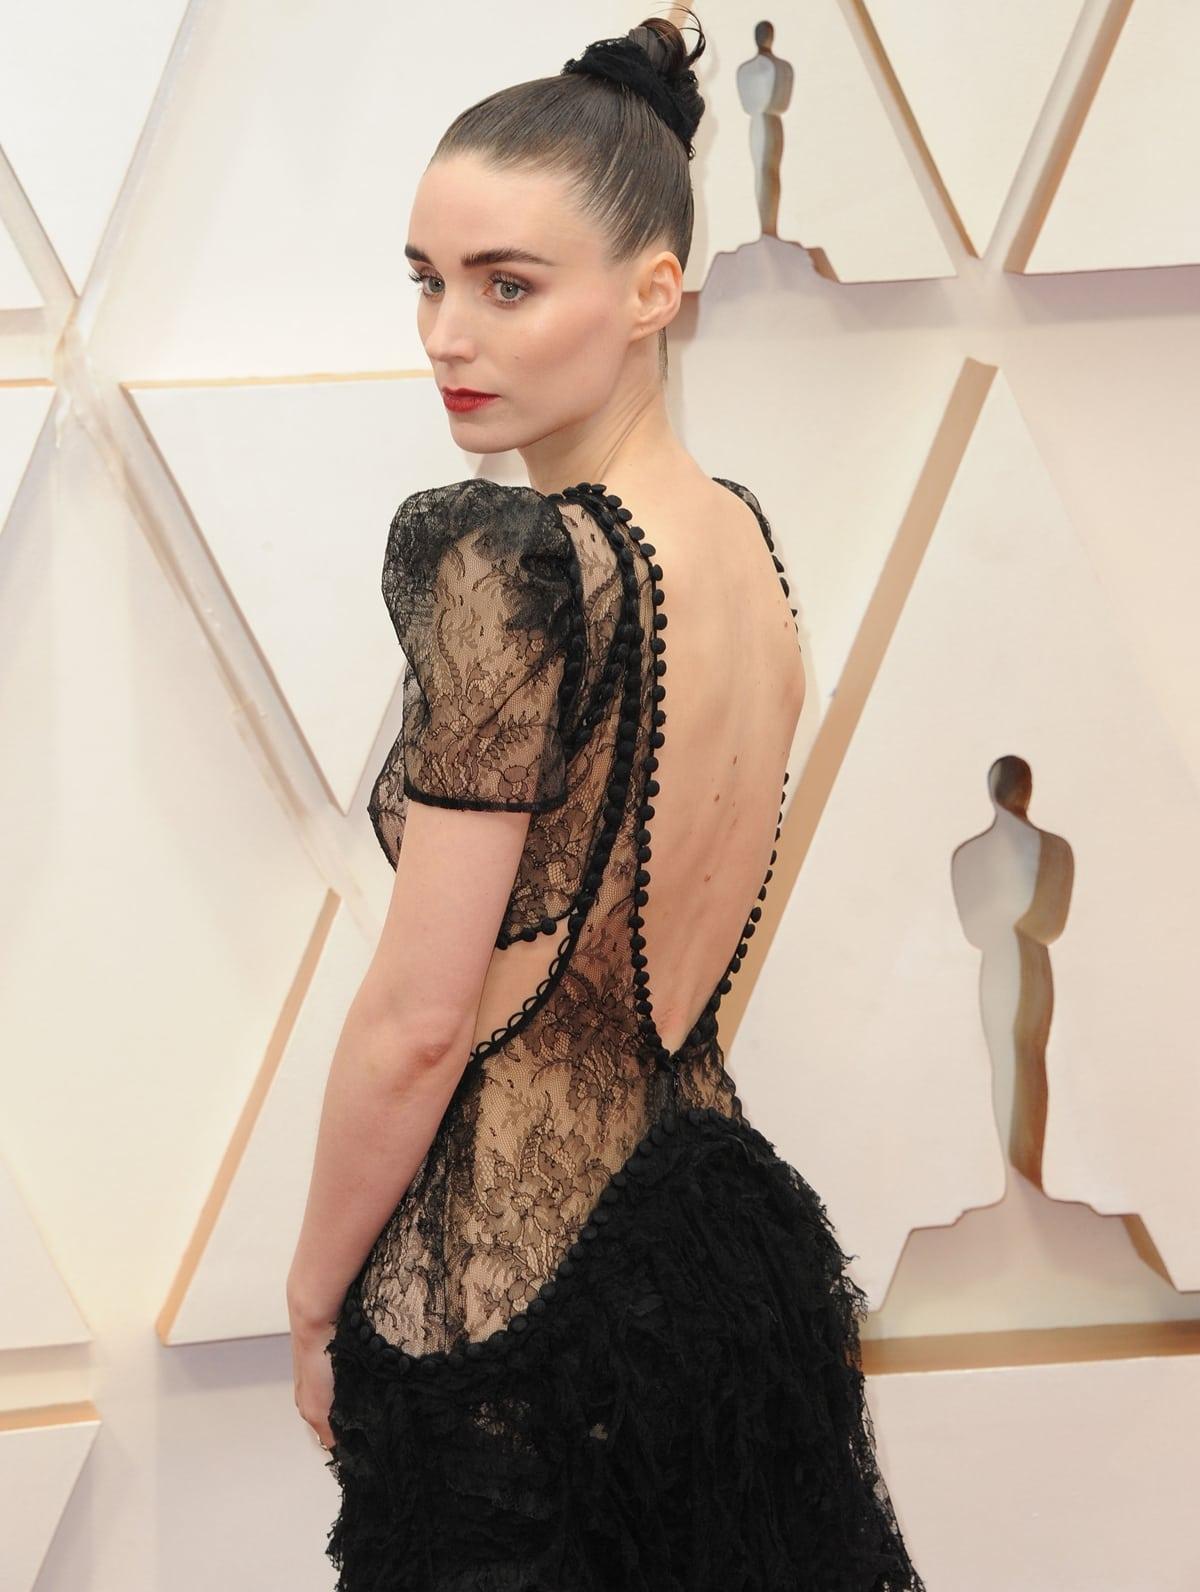 Rooney Mara in an Alexander McQueen frilled ruffle dress at the 2020 Academy Awards